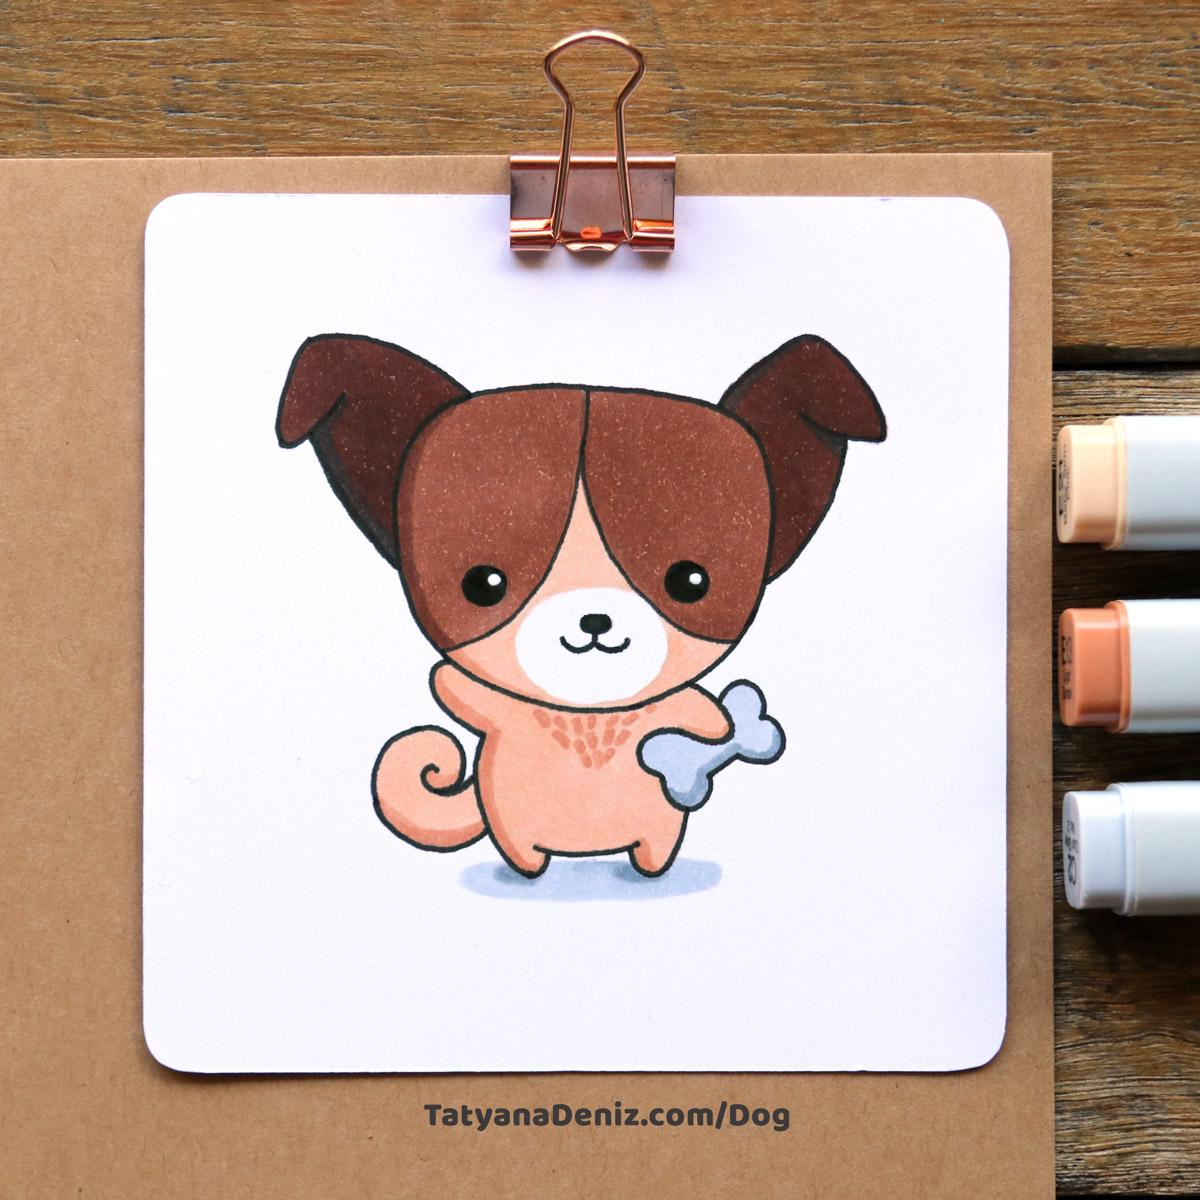 Kawaii dog step-by-step drawing tutorial